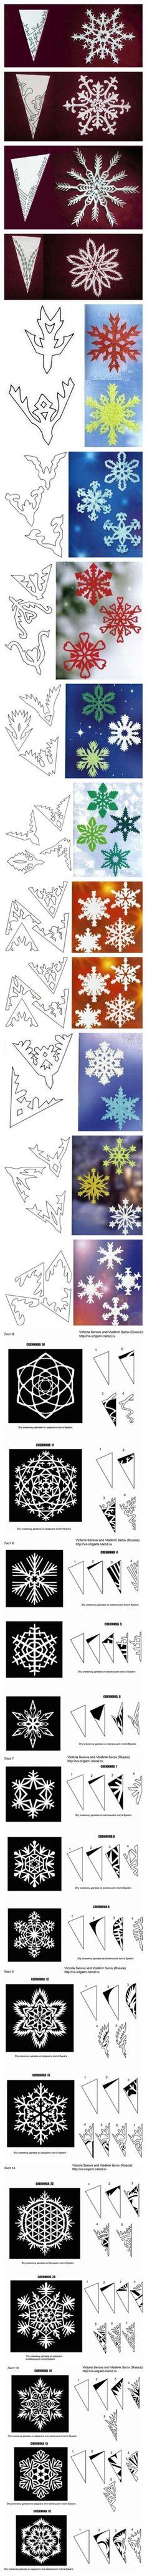 SaiFou Image via joybx.com. Snowflake templates.